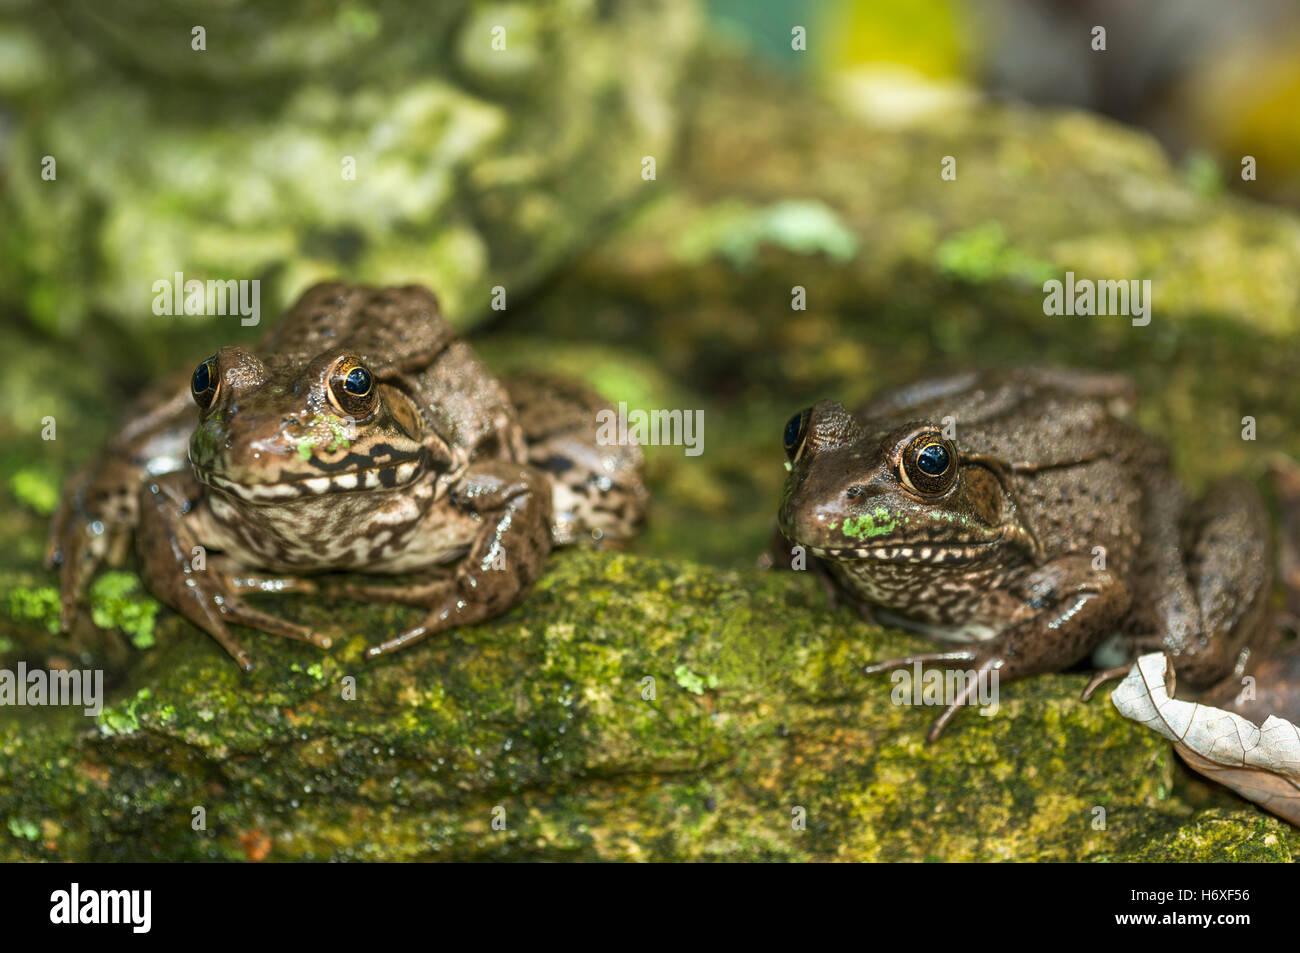 Südlichen Leopard Frog (Lithobates Sphenocephalus).  Tennessee, USA. Stockbild